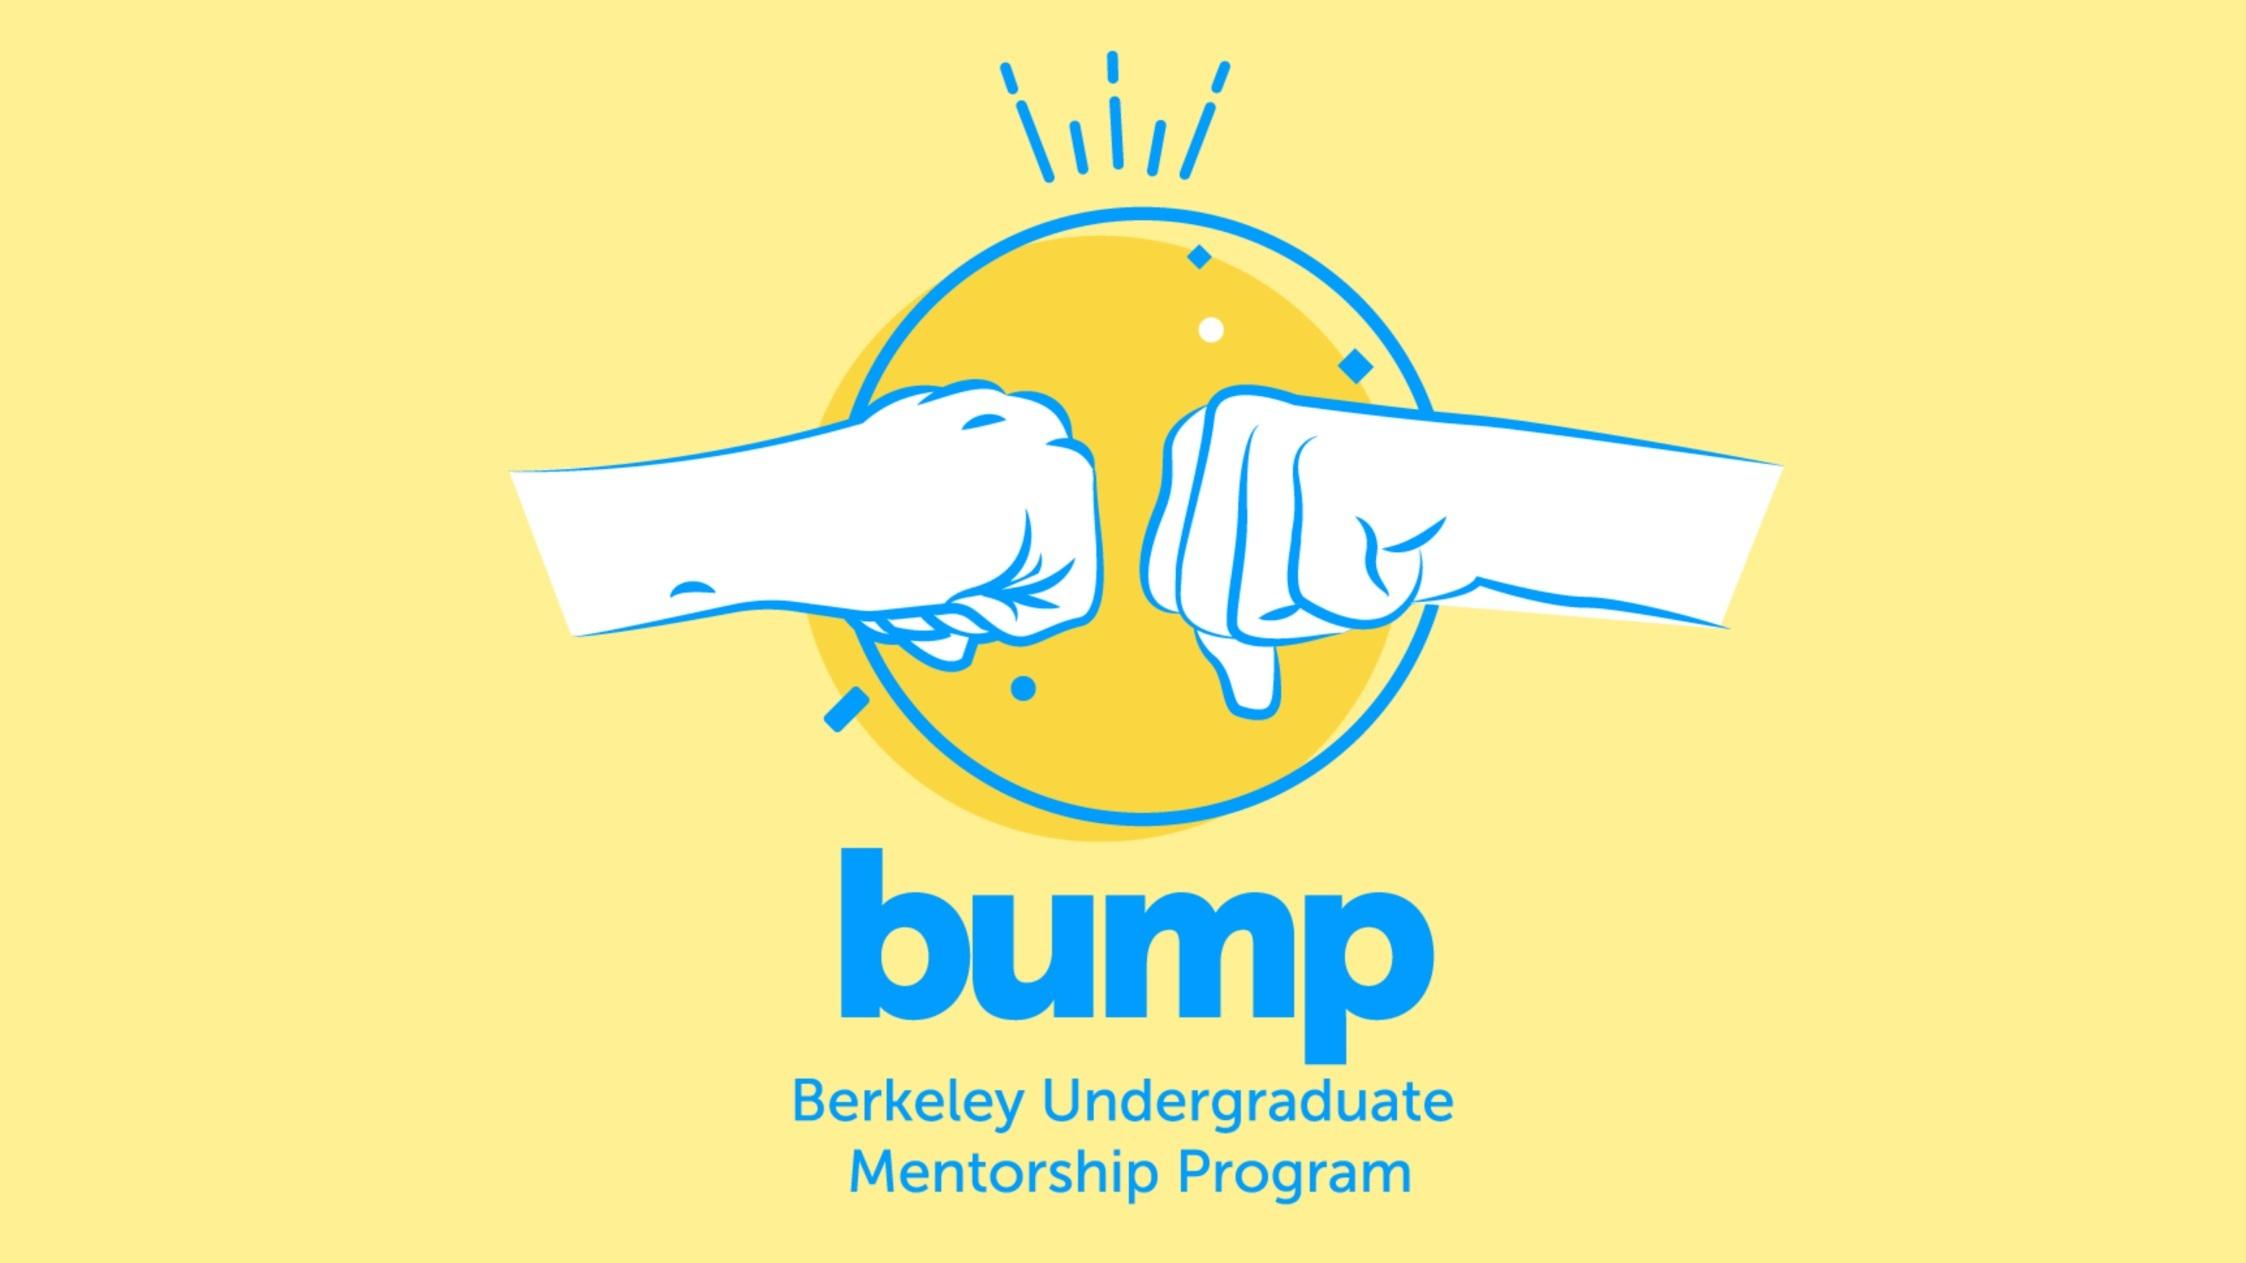 Berkeley Undergraduate Mentorship Program